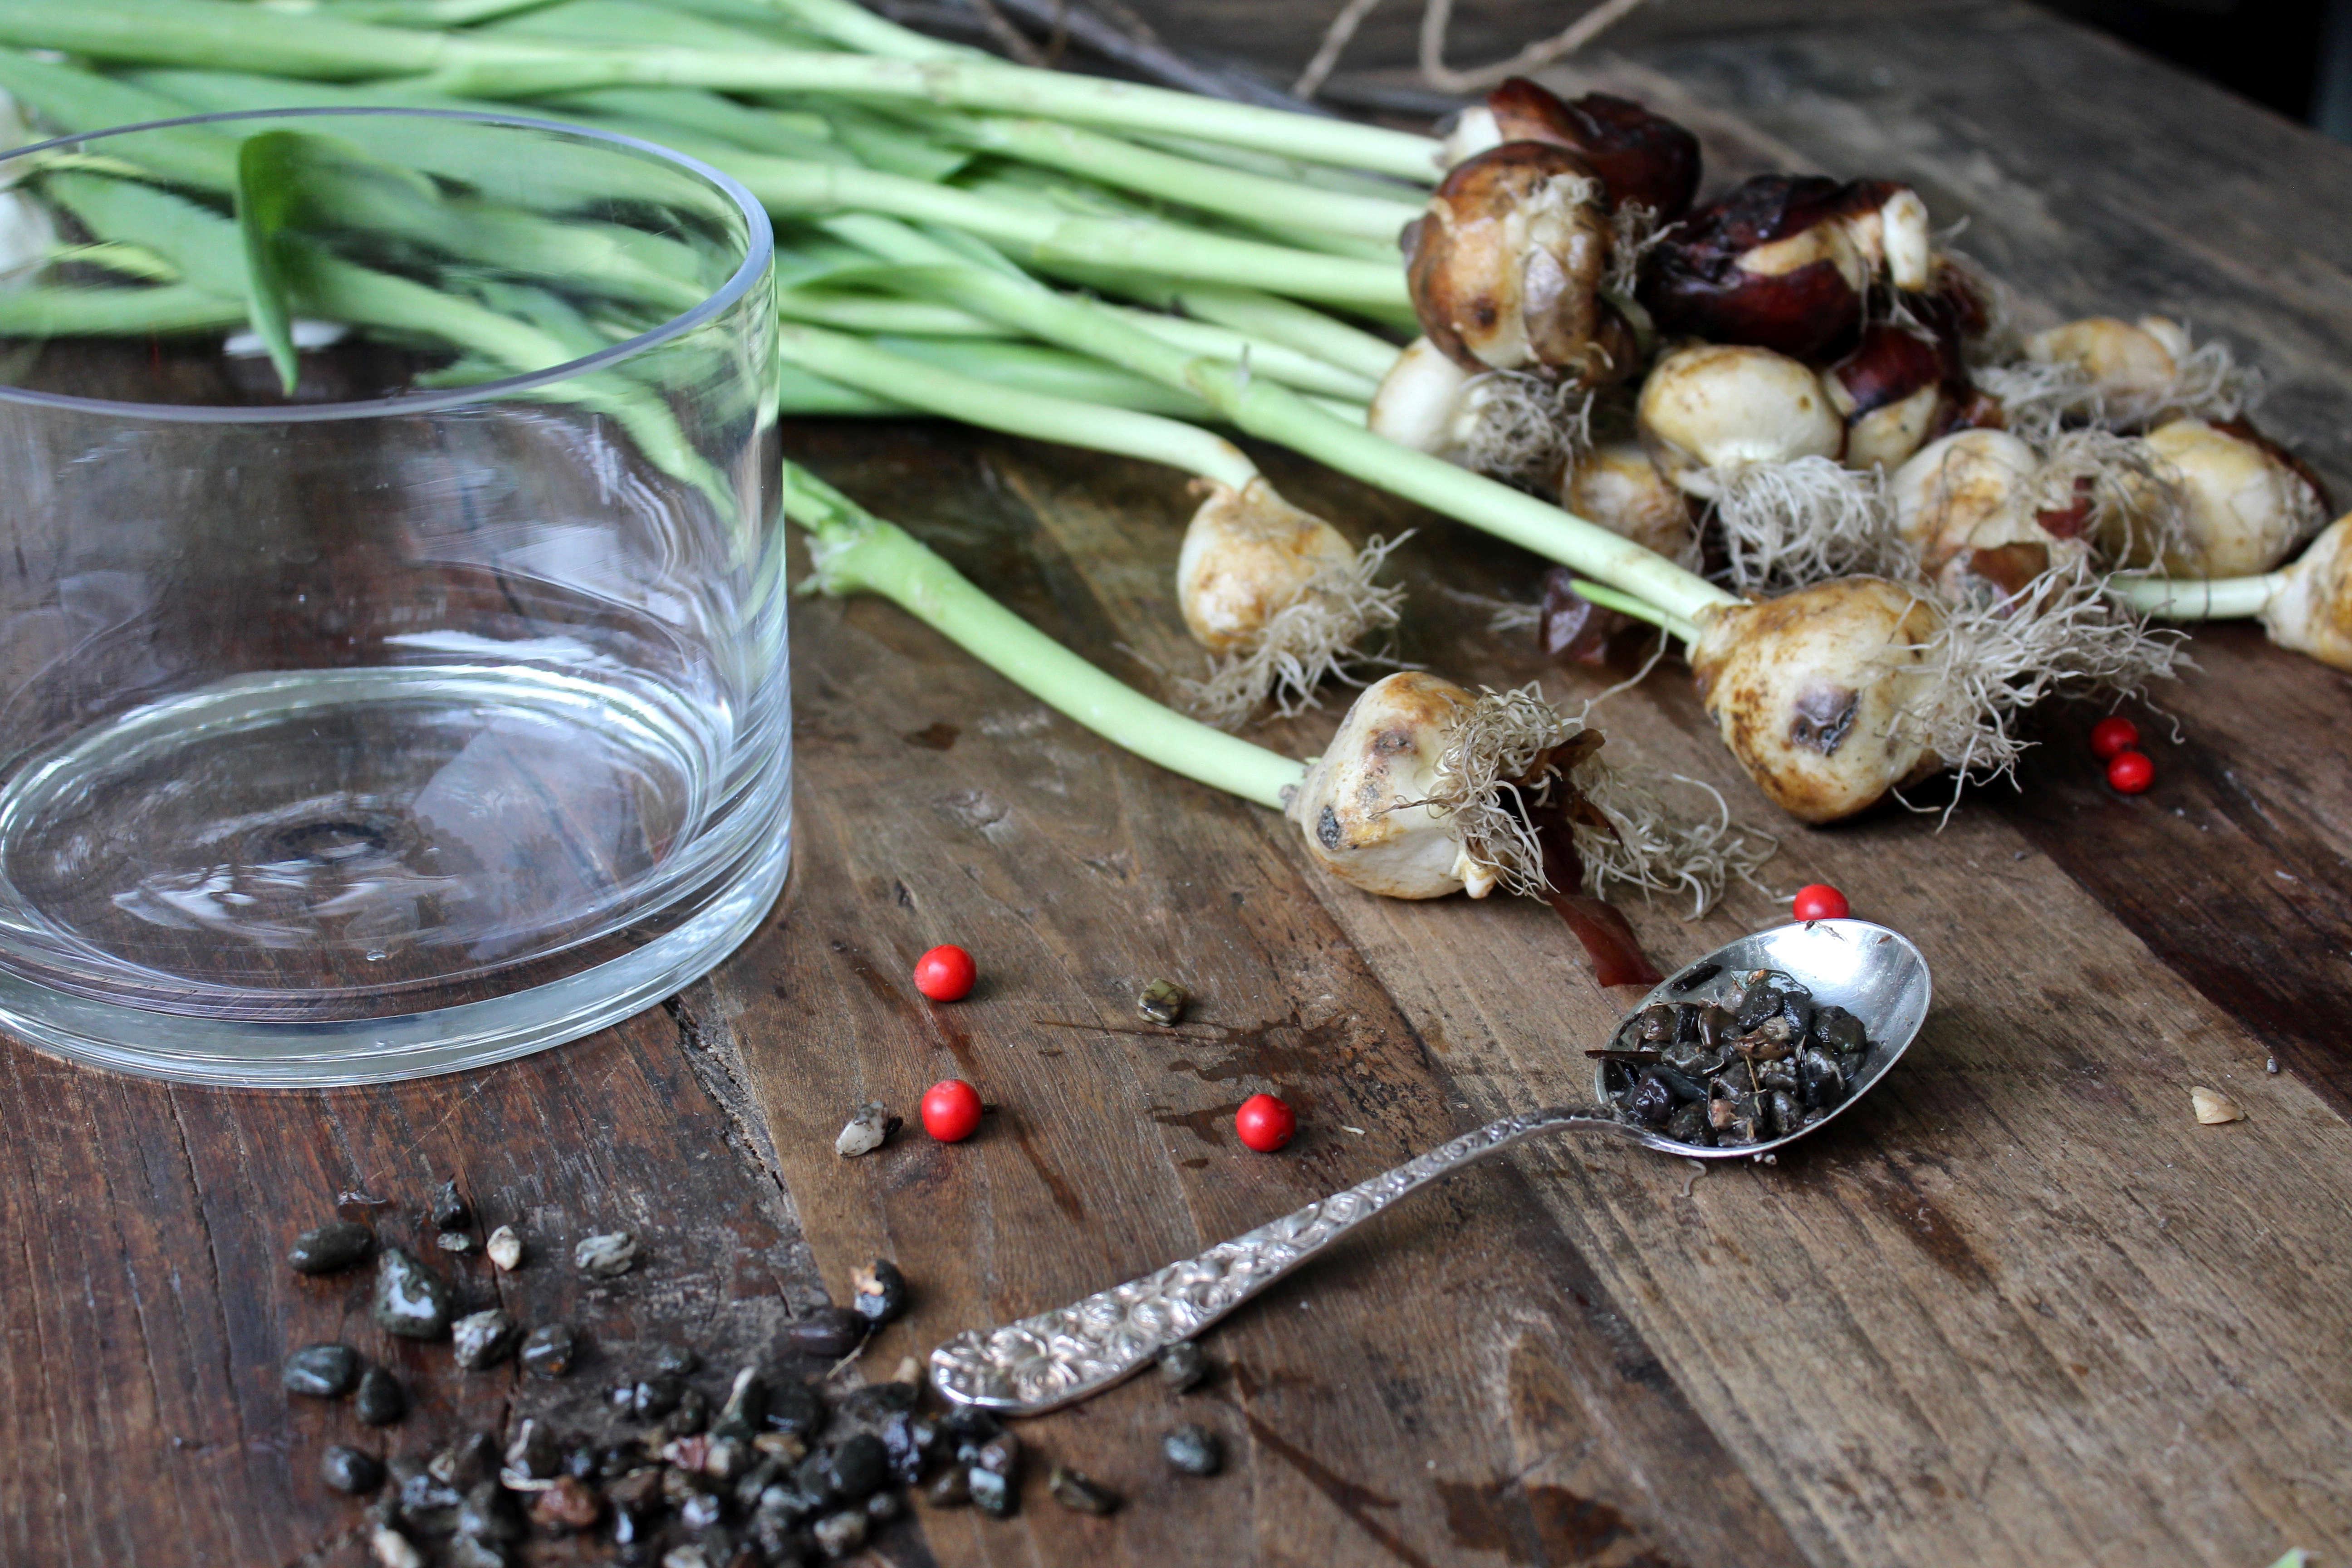 tulips-on-the-bulb-michelle-slatalla-img-3741